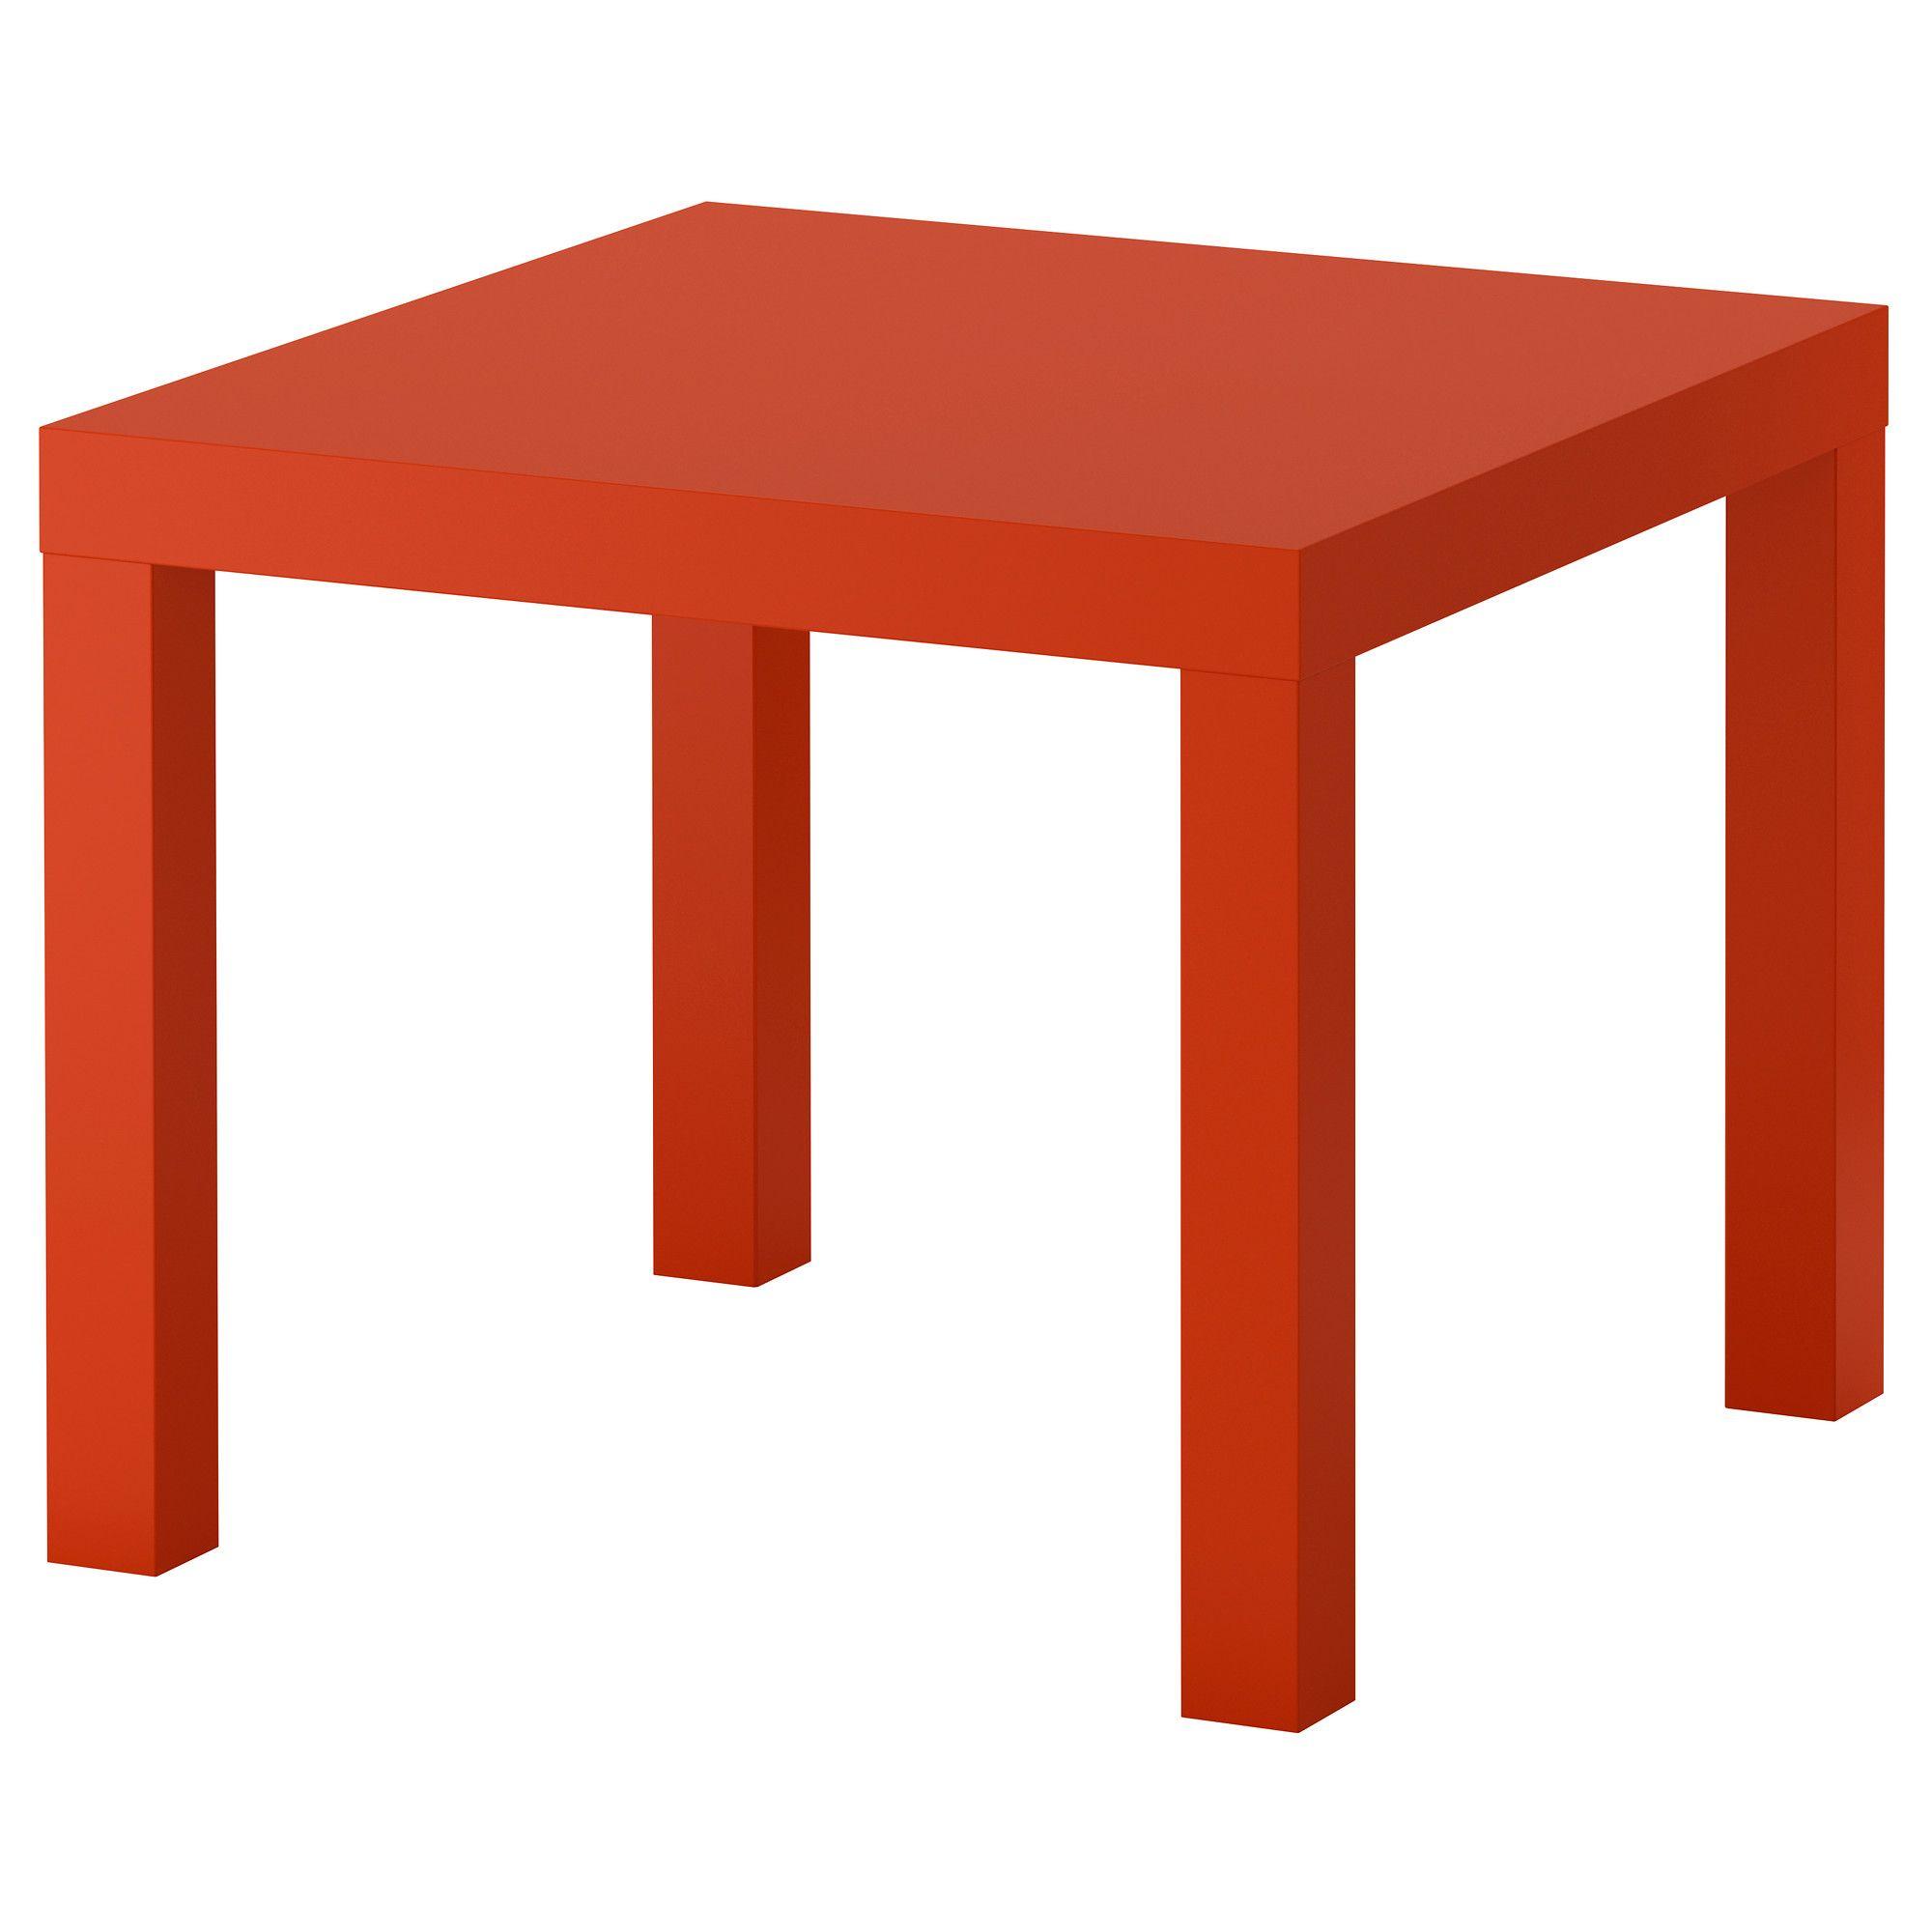 lack side table  orange  x    ikea dave loves orange  - lack side table  orange  x    ikea